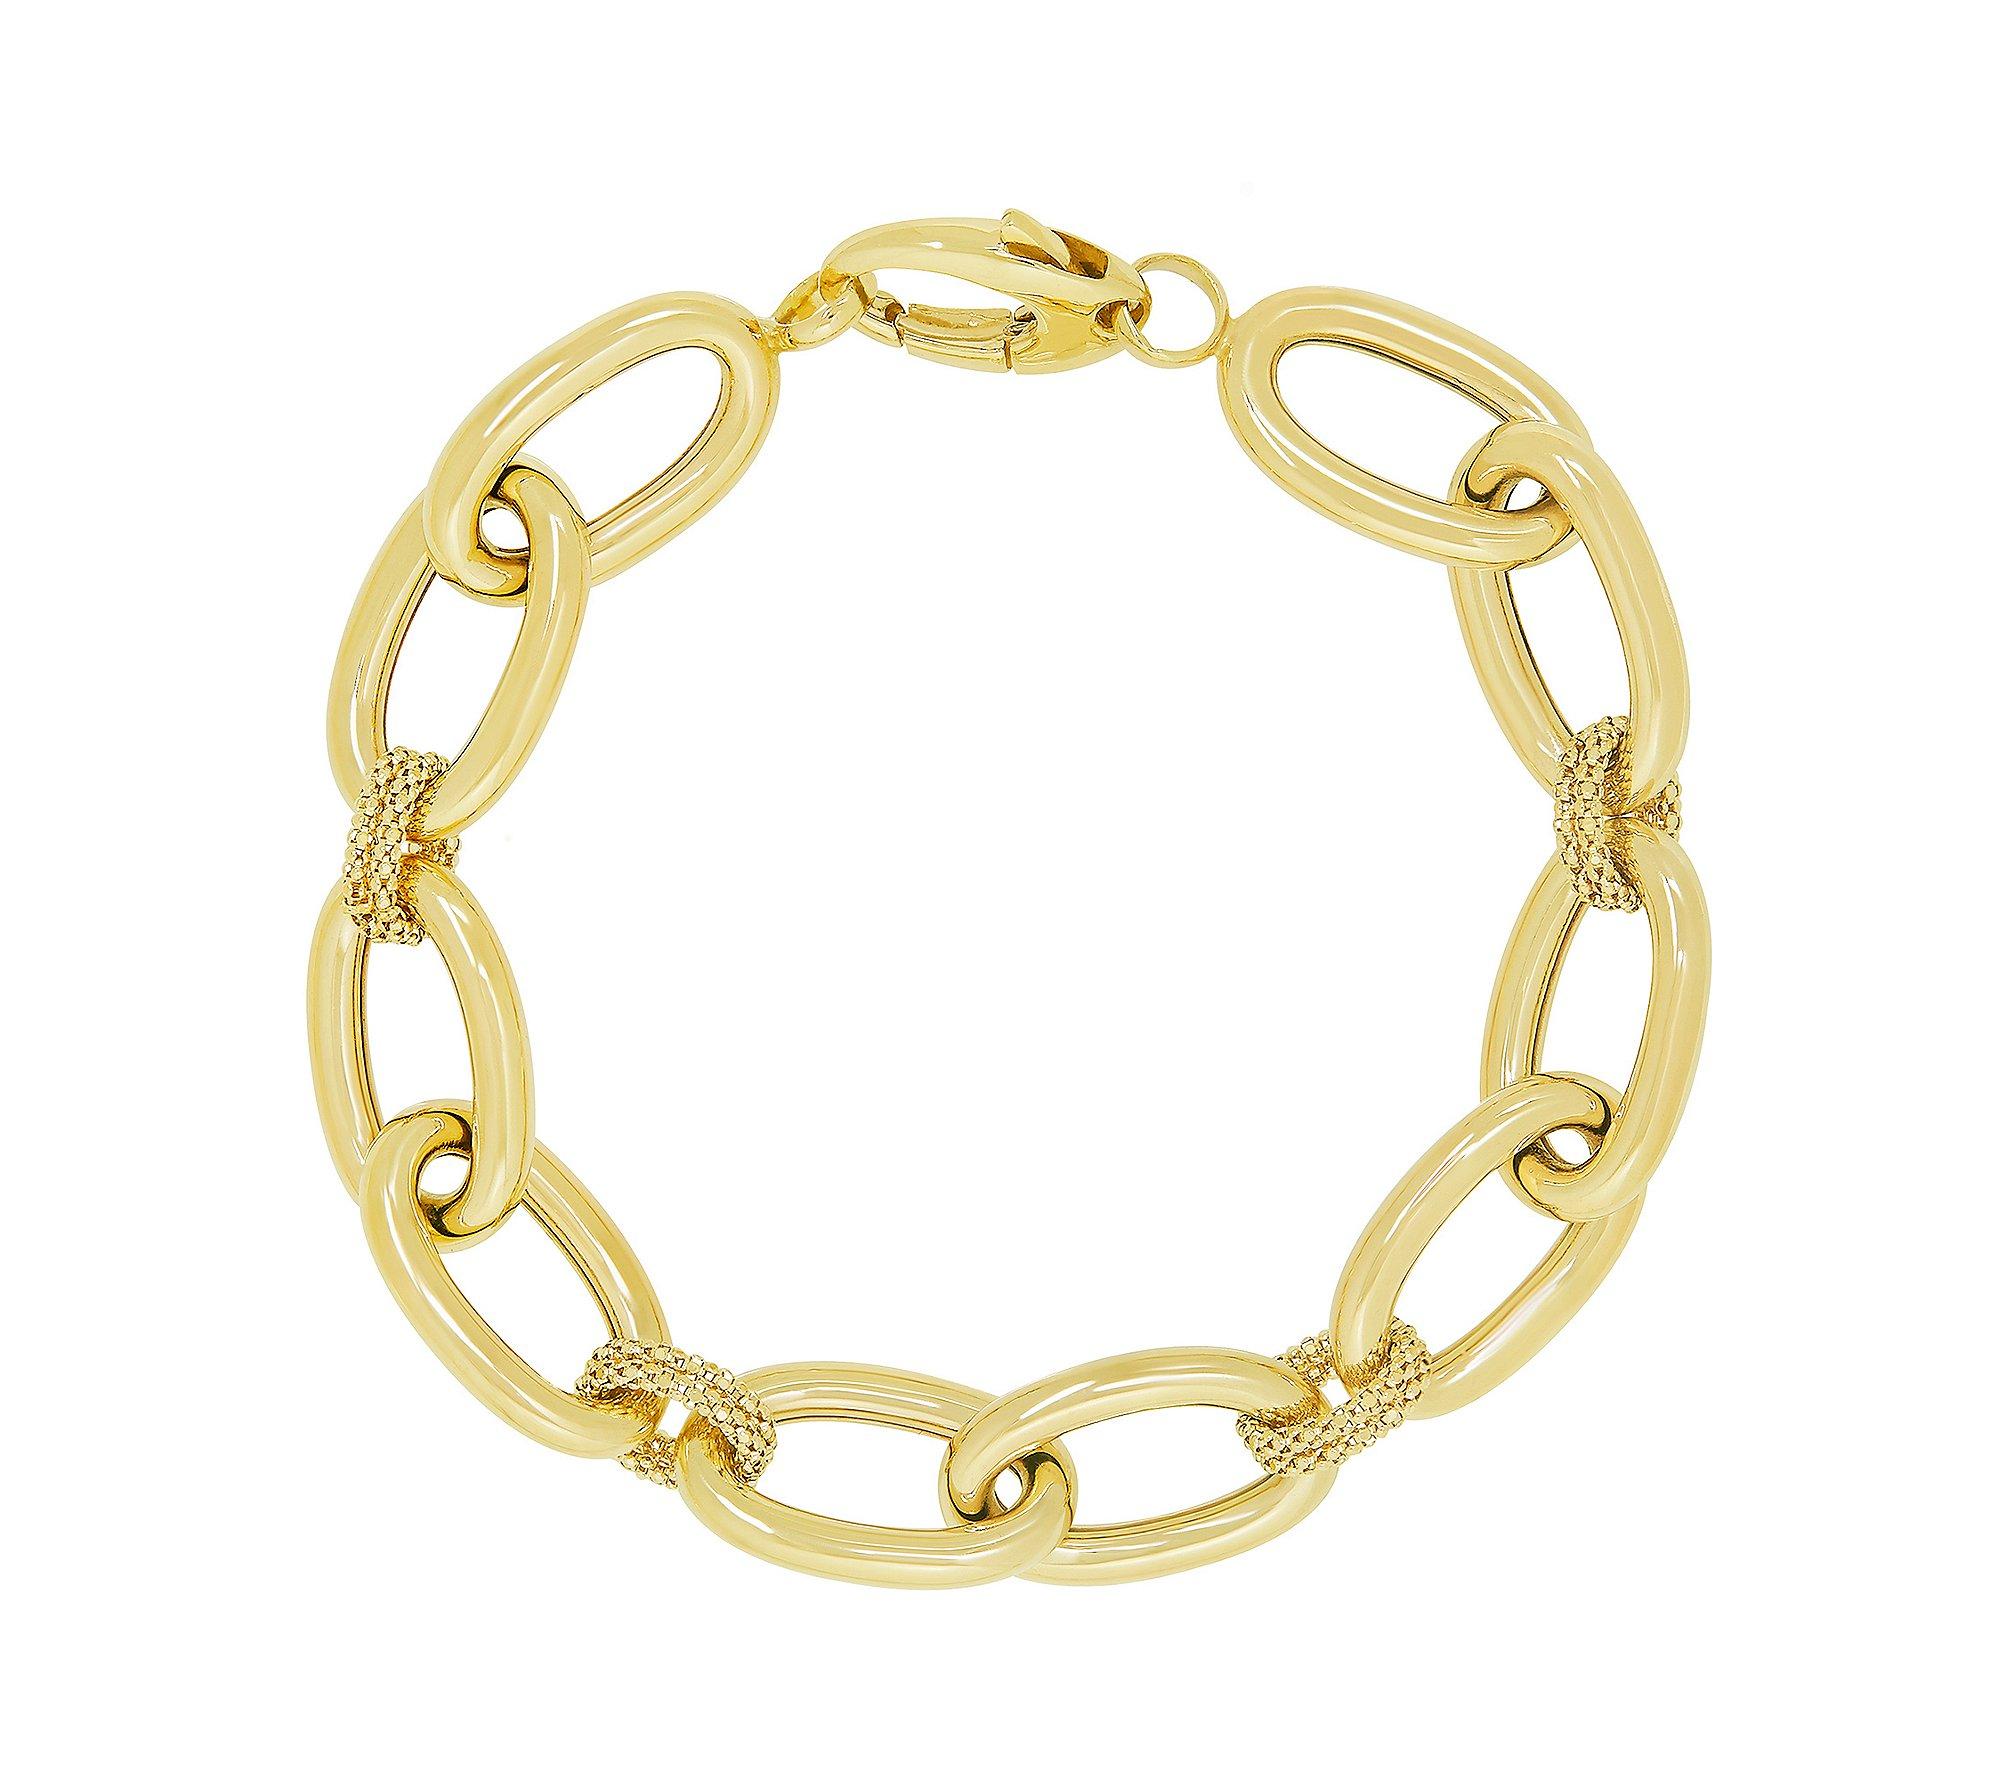 14K Yellow Gold Polished Oval Link Bracelet with Popcorn Stations Gold